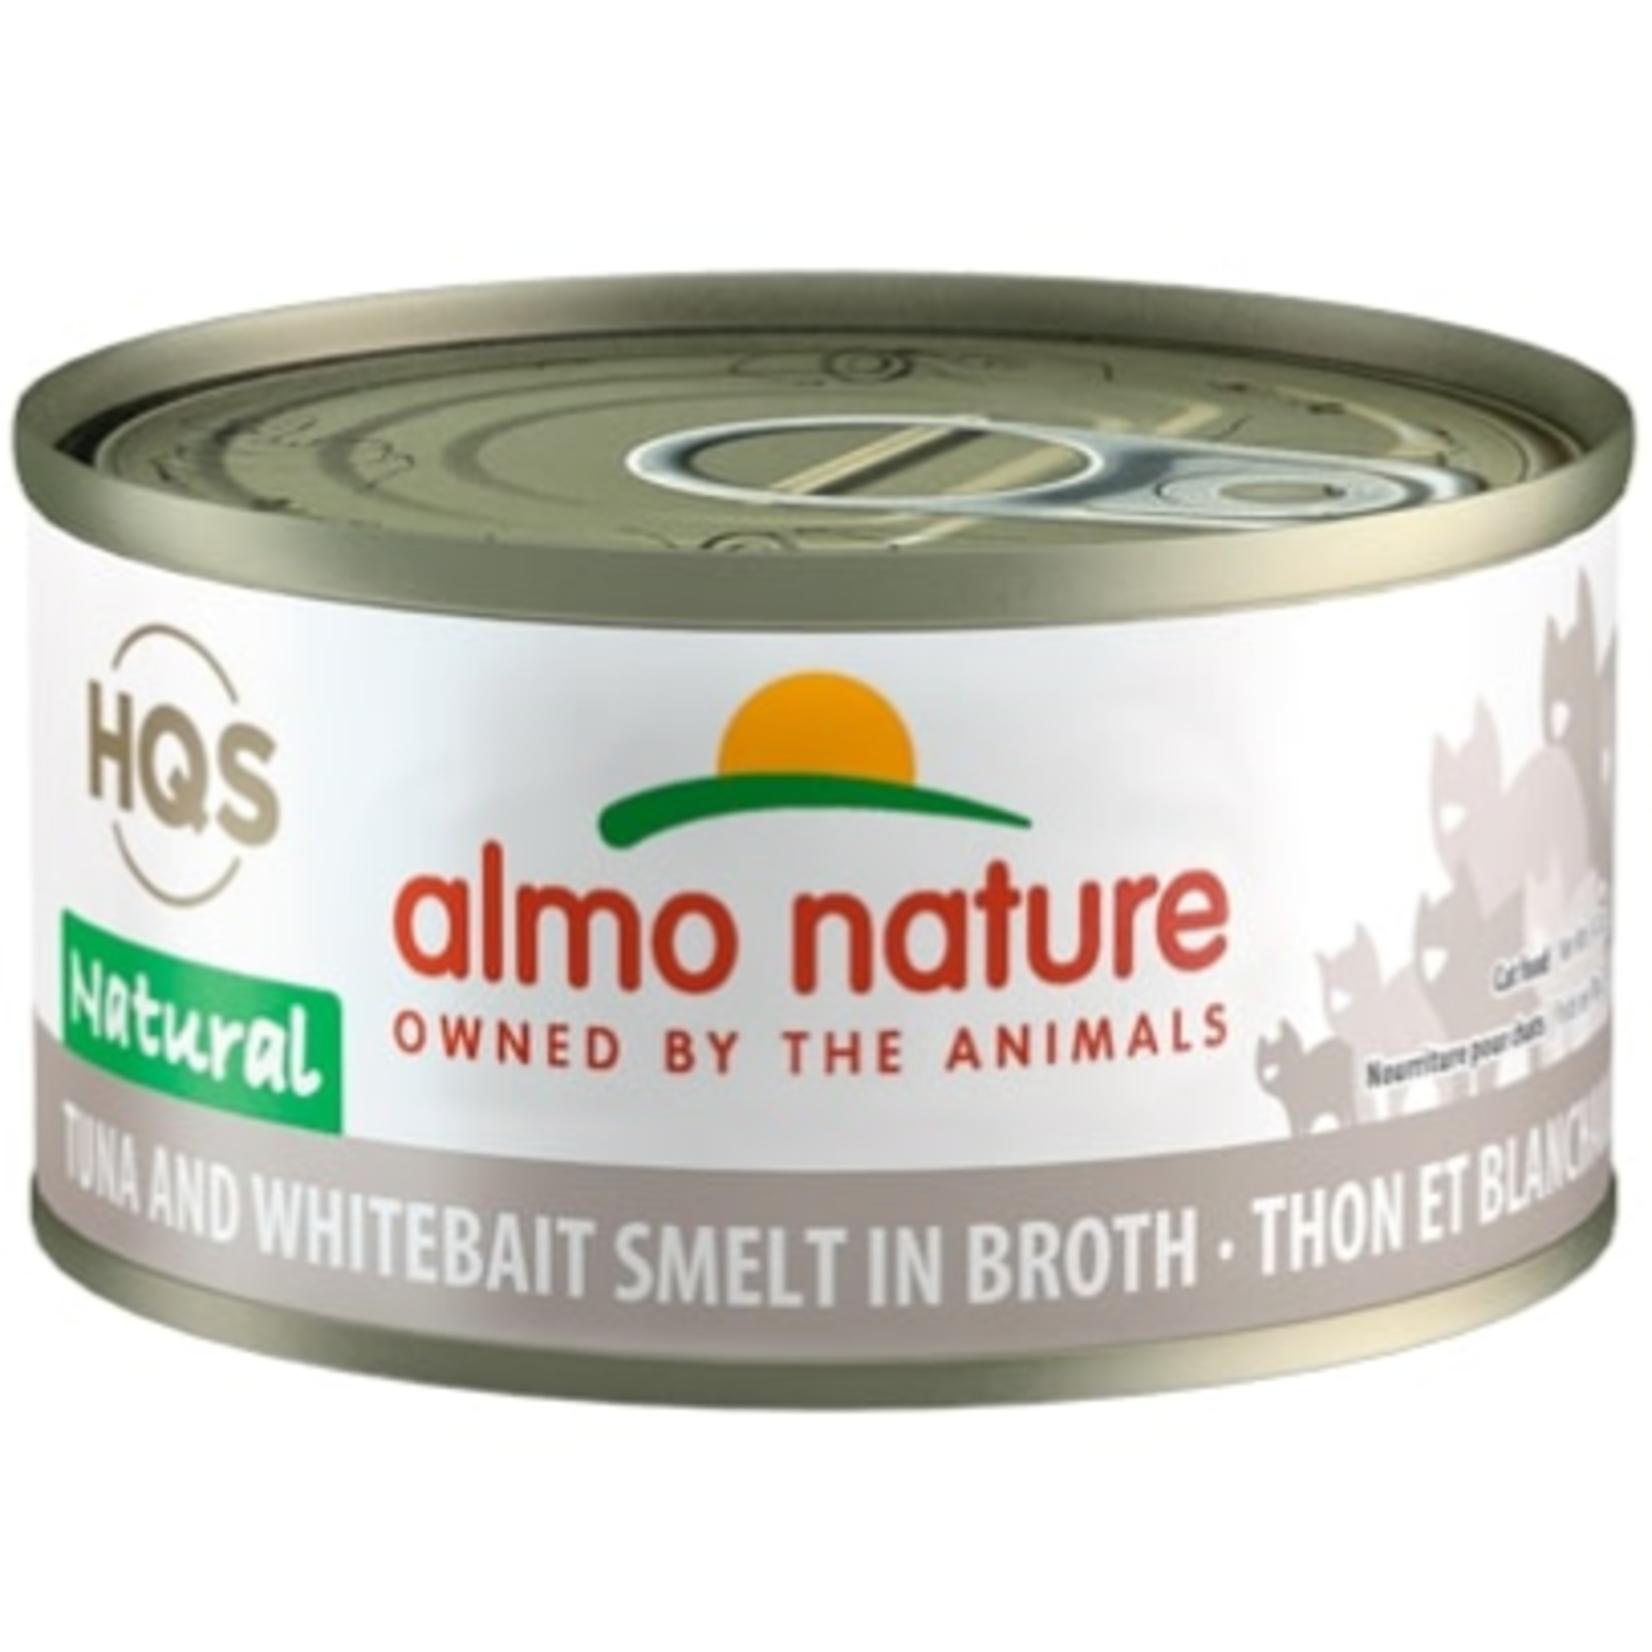 Almo Tuna and Whitebait Smelt in broth -70 g